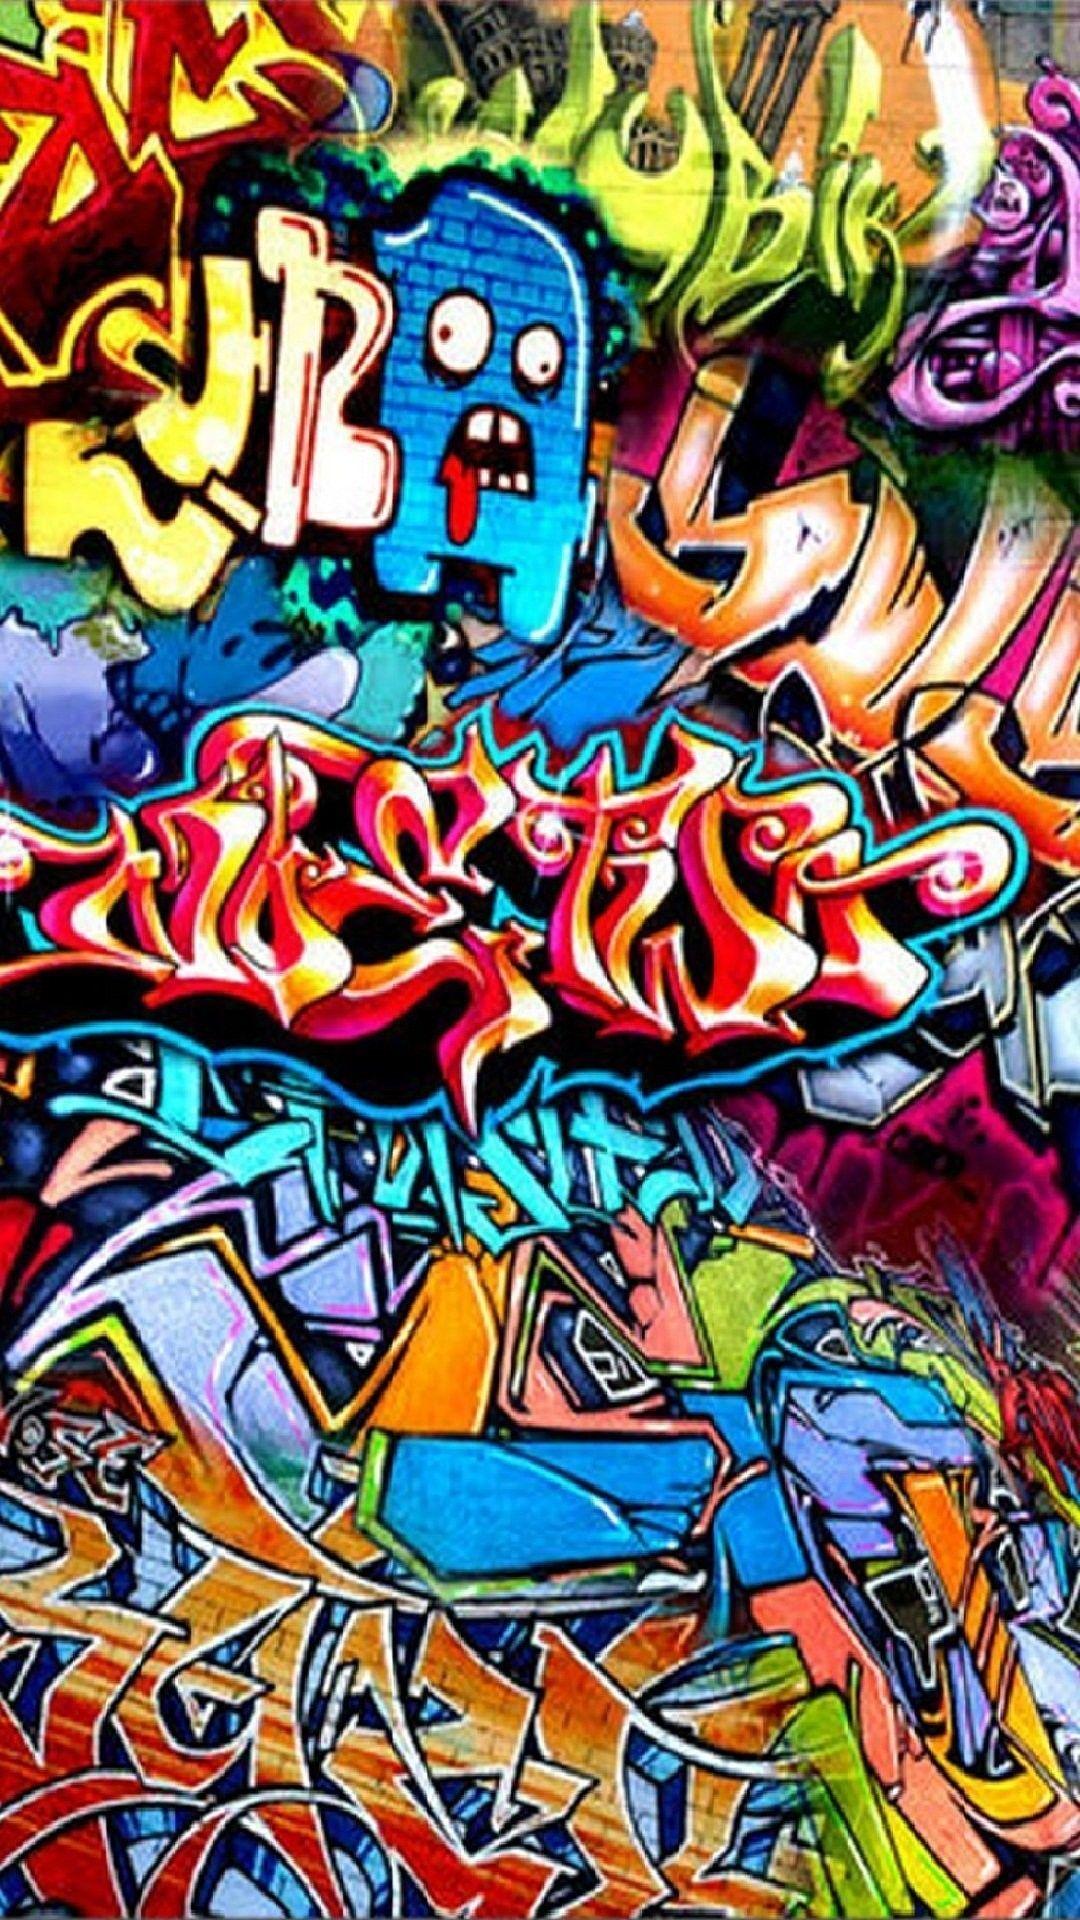 Swag Cool Graffiti Wallpaper Flip Wallpapers Download Free Wallpaper Hd In 2020 Graffiti Wallpaper Hd Wallpaper Iphone Graffiti